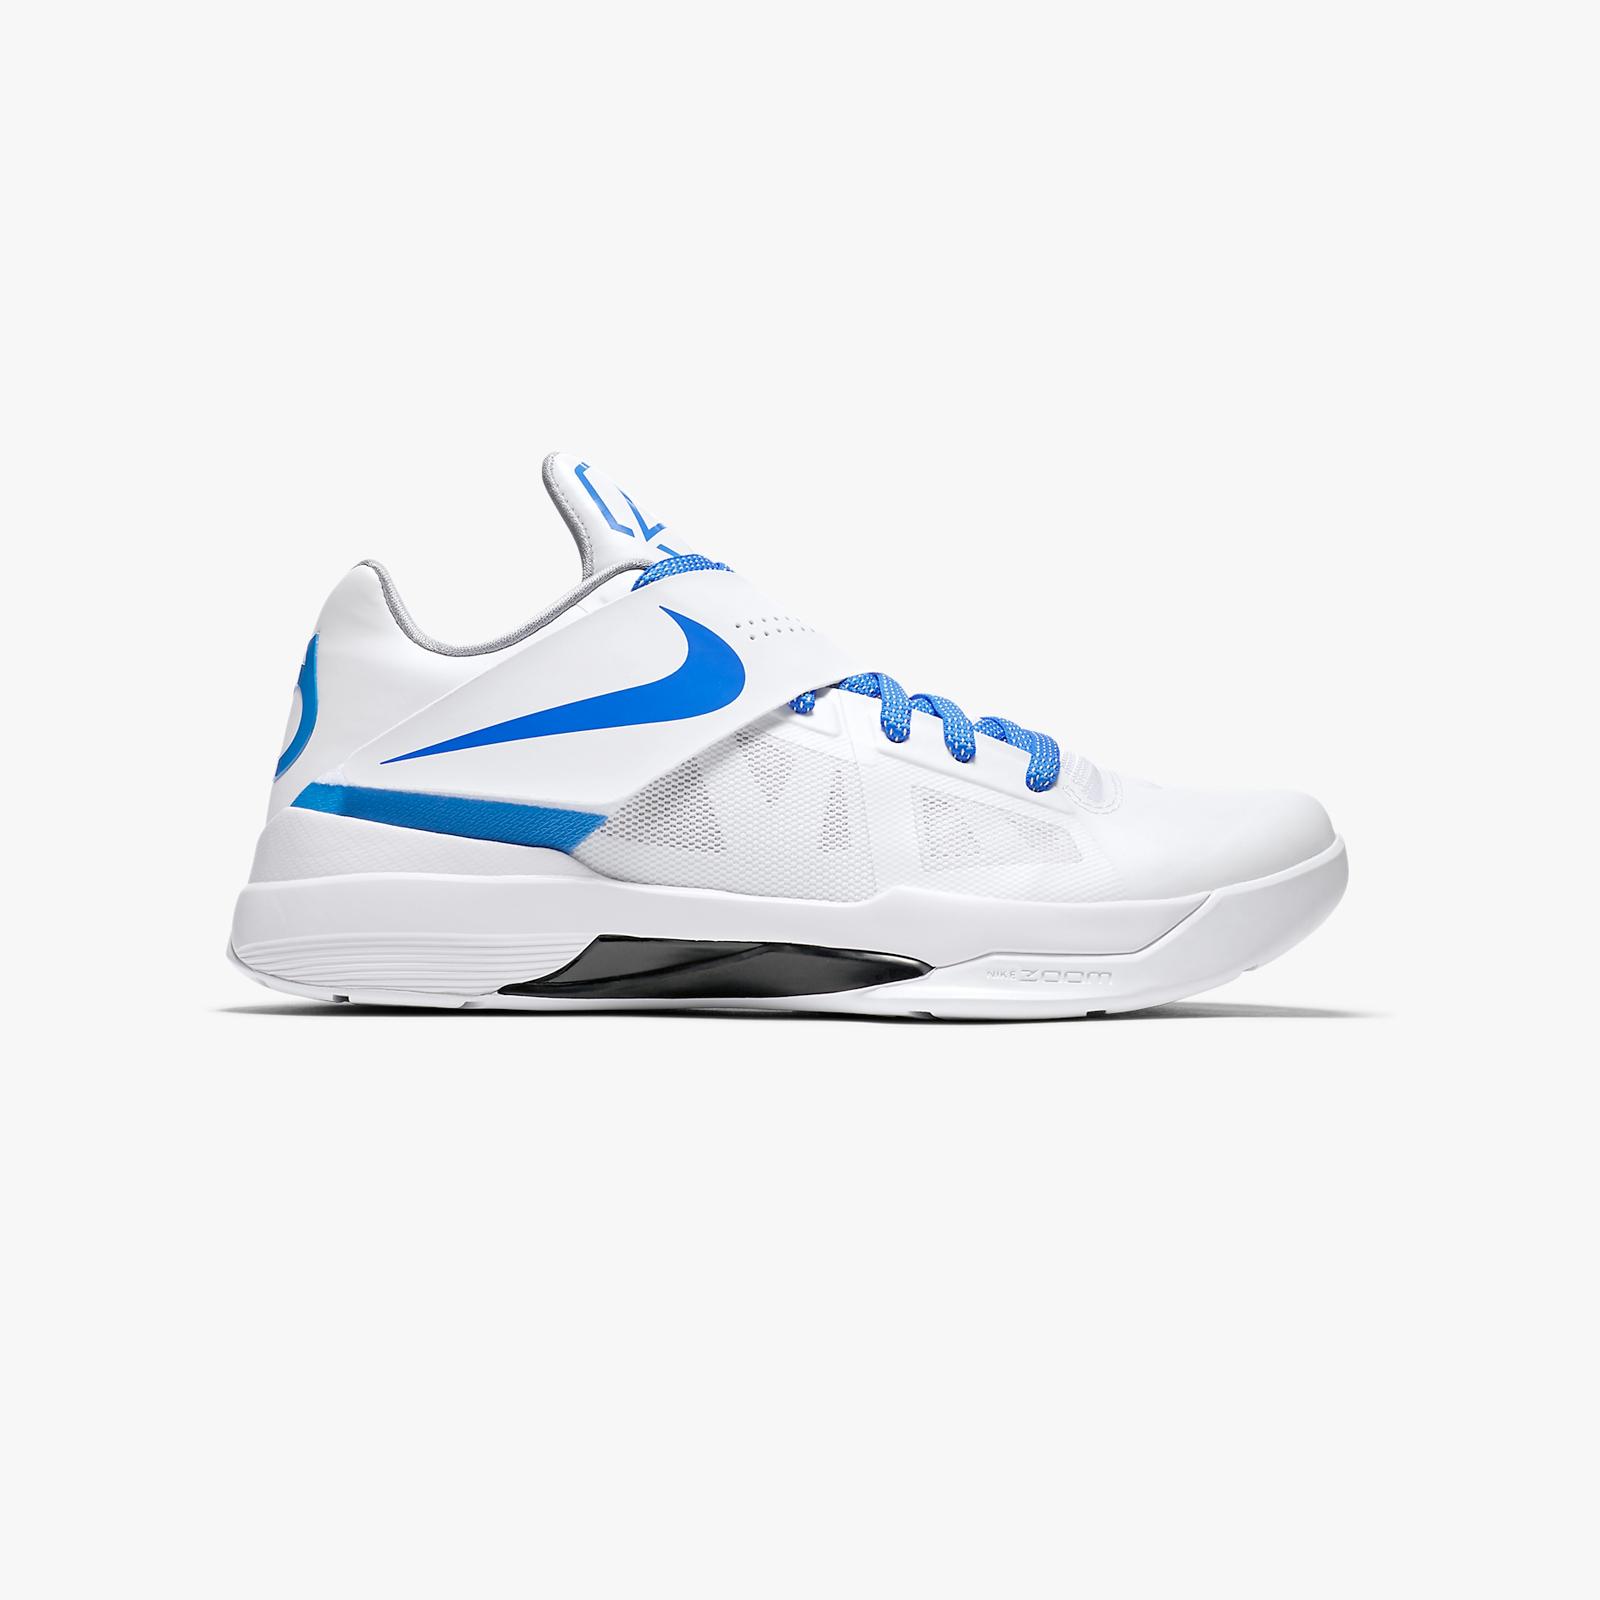 more photos f666e 14850 Nike Basketball Zoom KD IV CT 16 QS